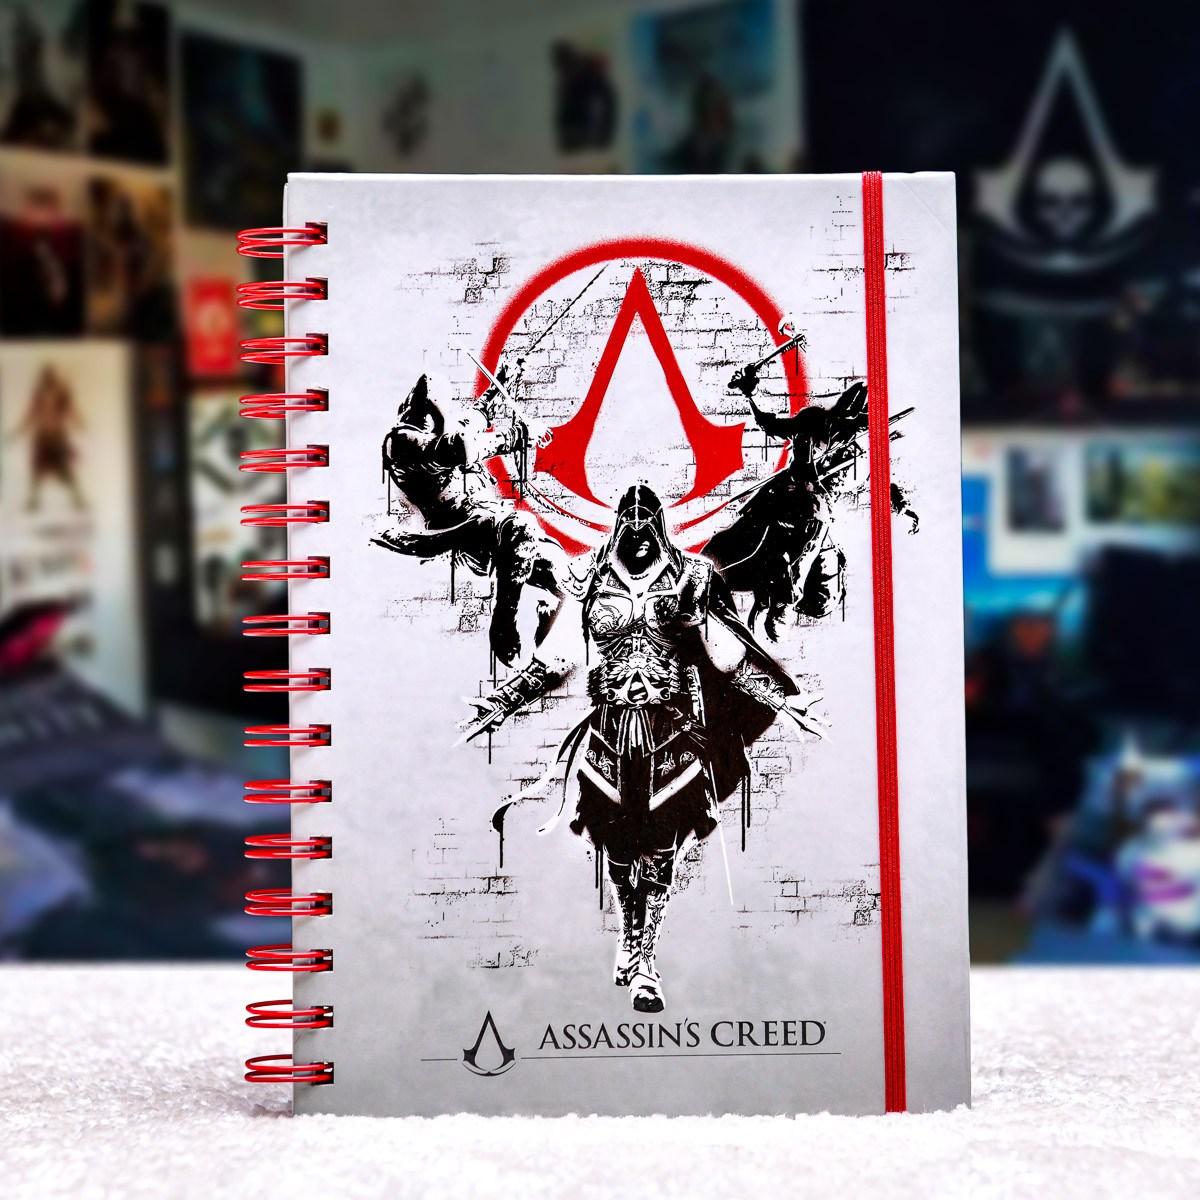 Assassin's Creed Kidboxeo